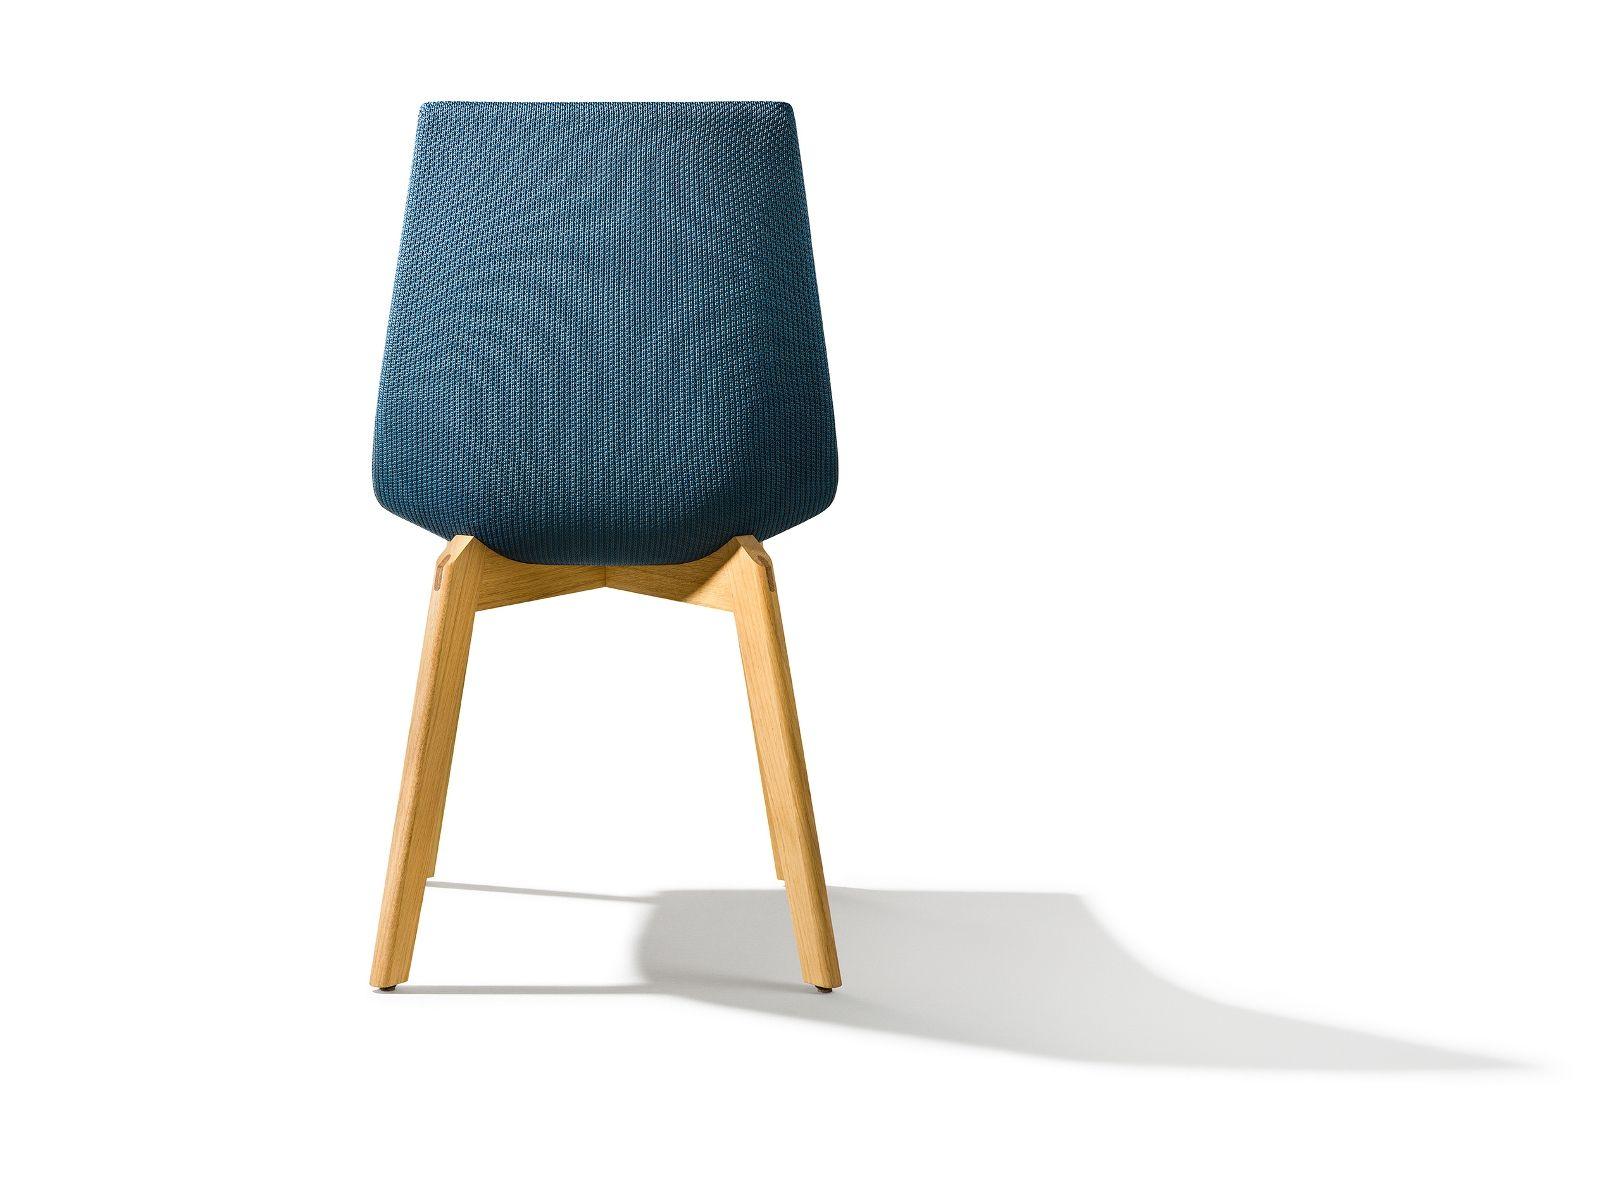 lui stuhl aus stoff by team 7 nat rlich wohnen design jacob strobel. Black Bedroom Furniture Sets. Home Design Ideas